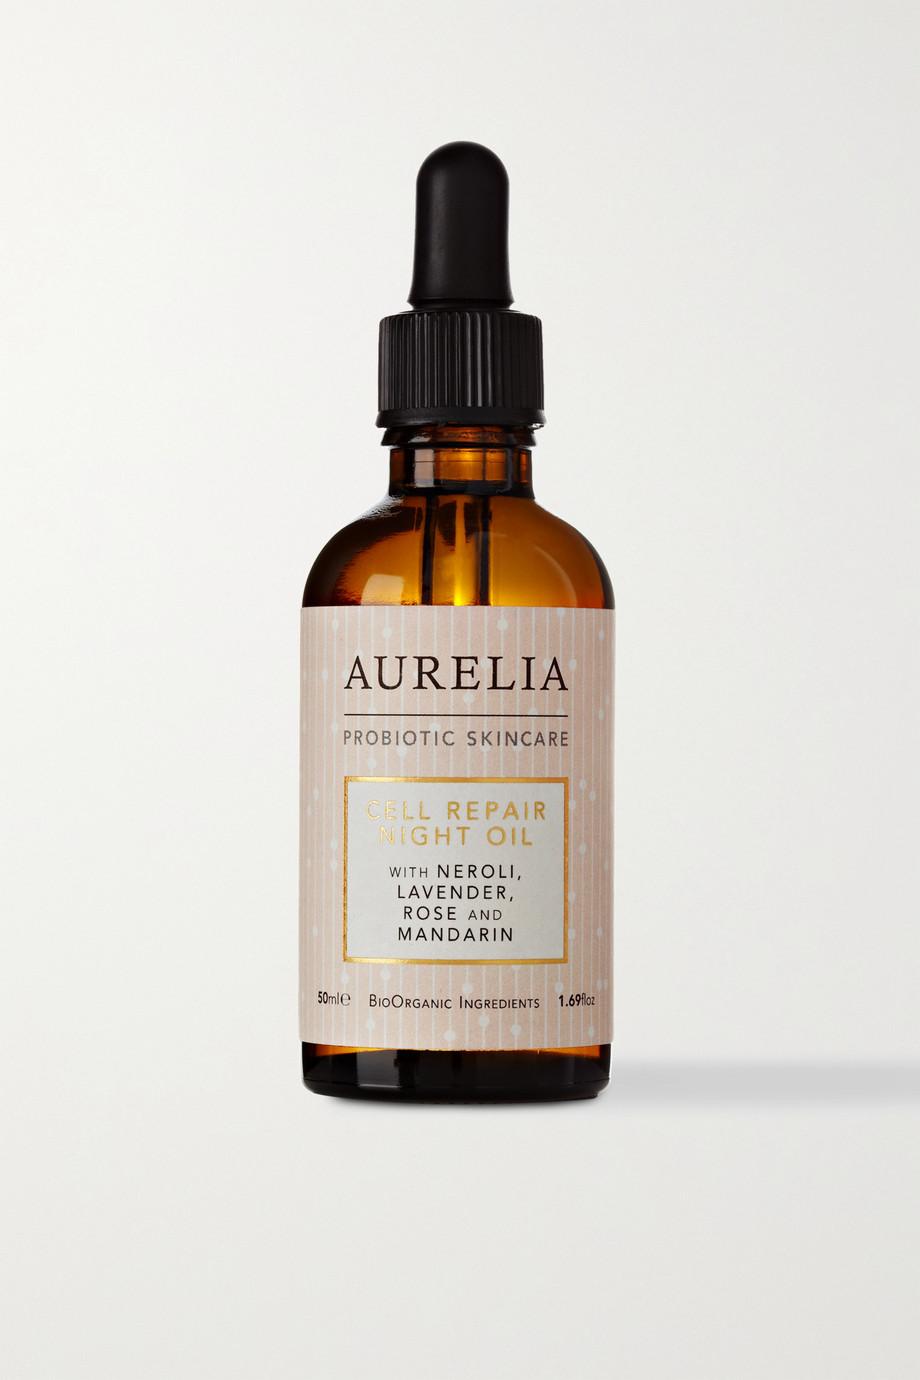 Cell Repair Night Oil, 50ml, by Aurelia Probiotic Skincare